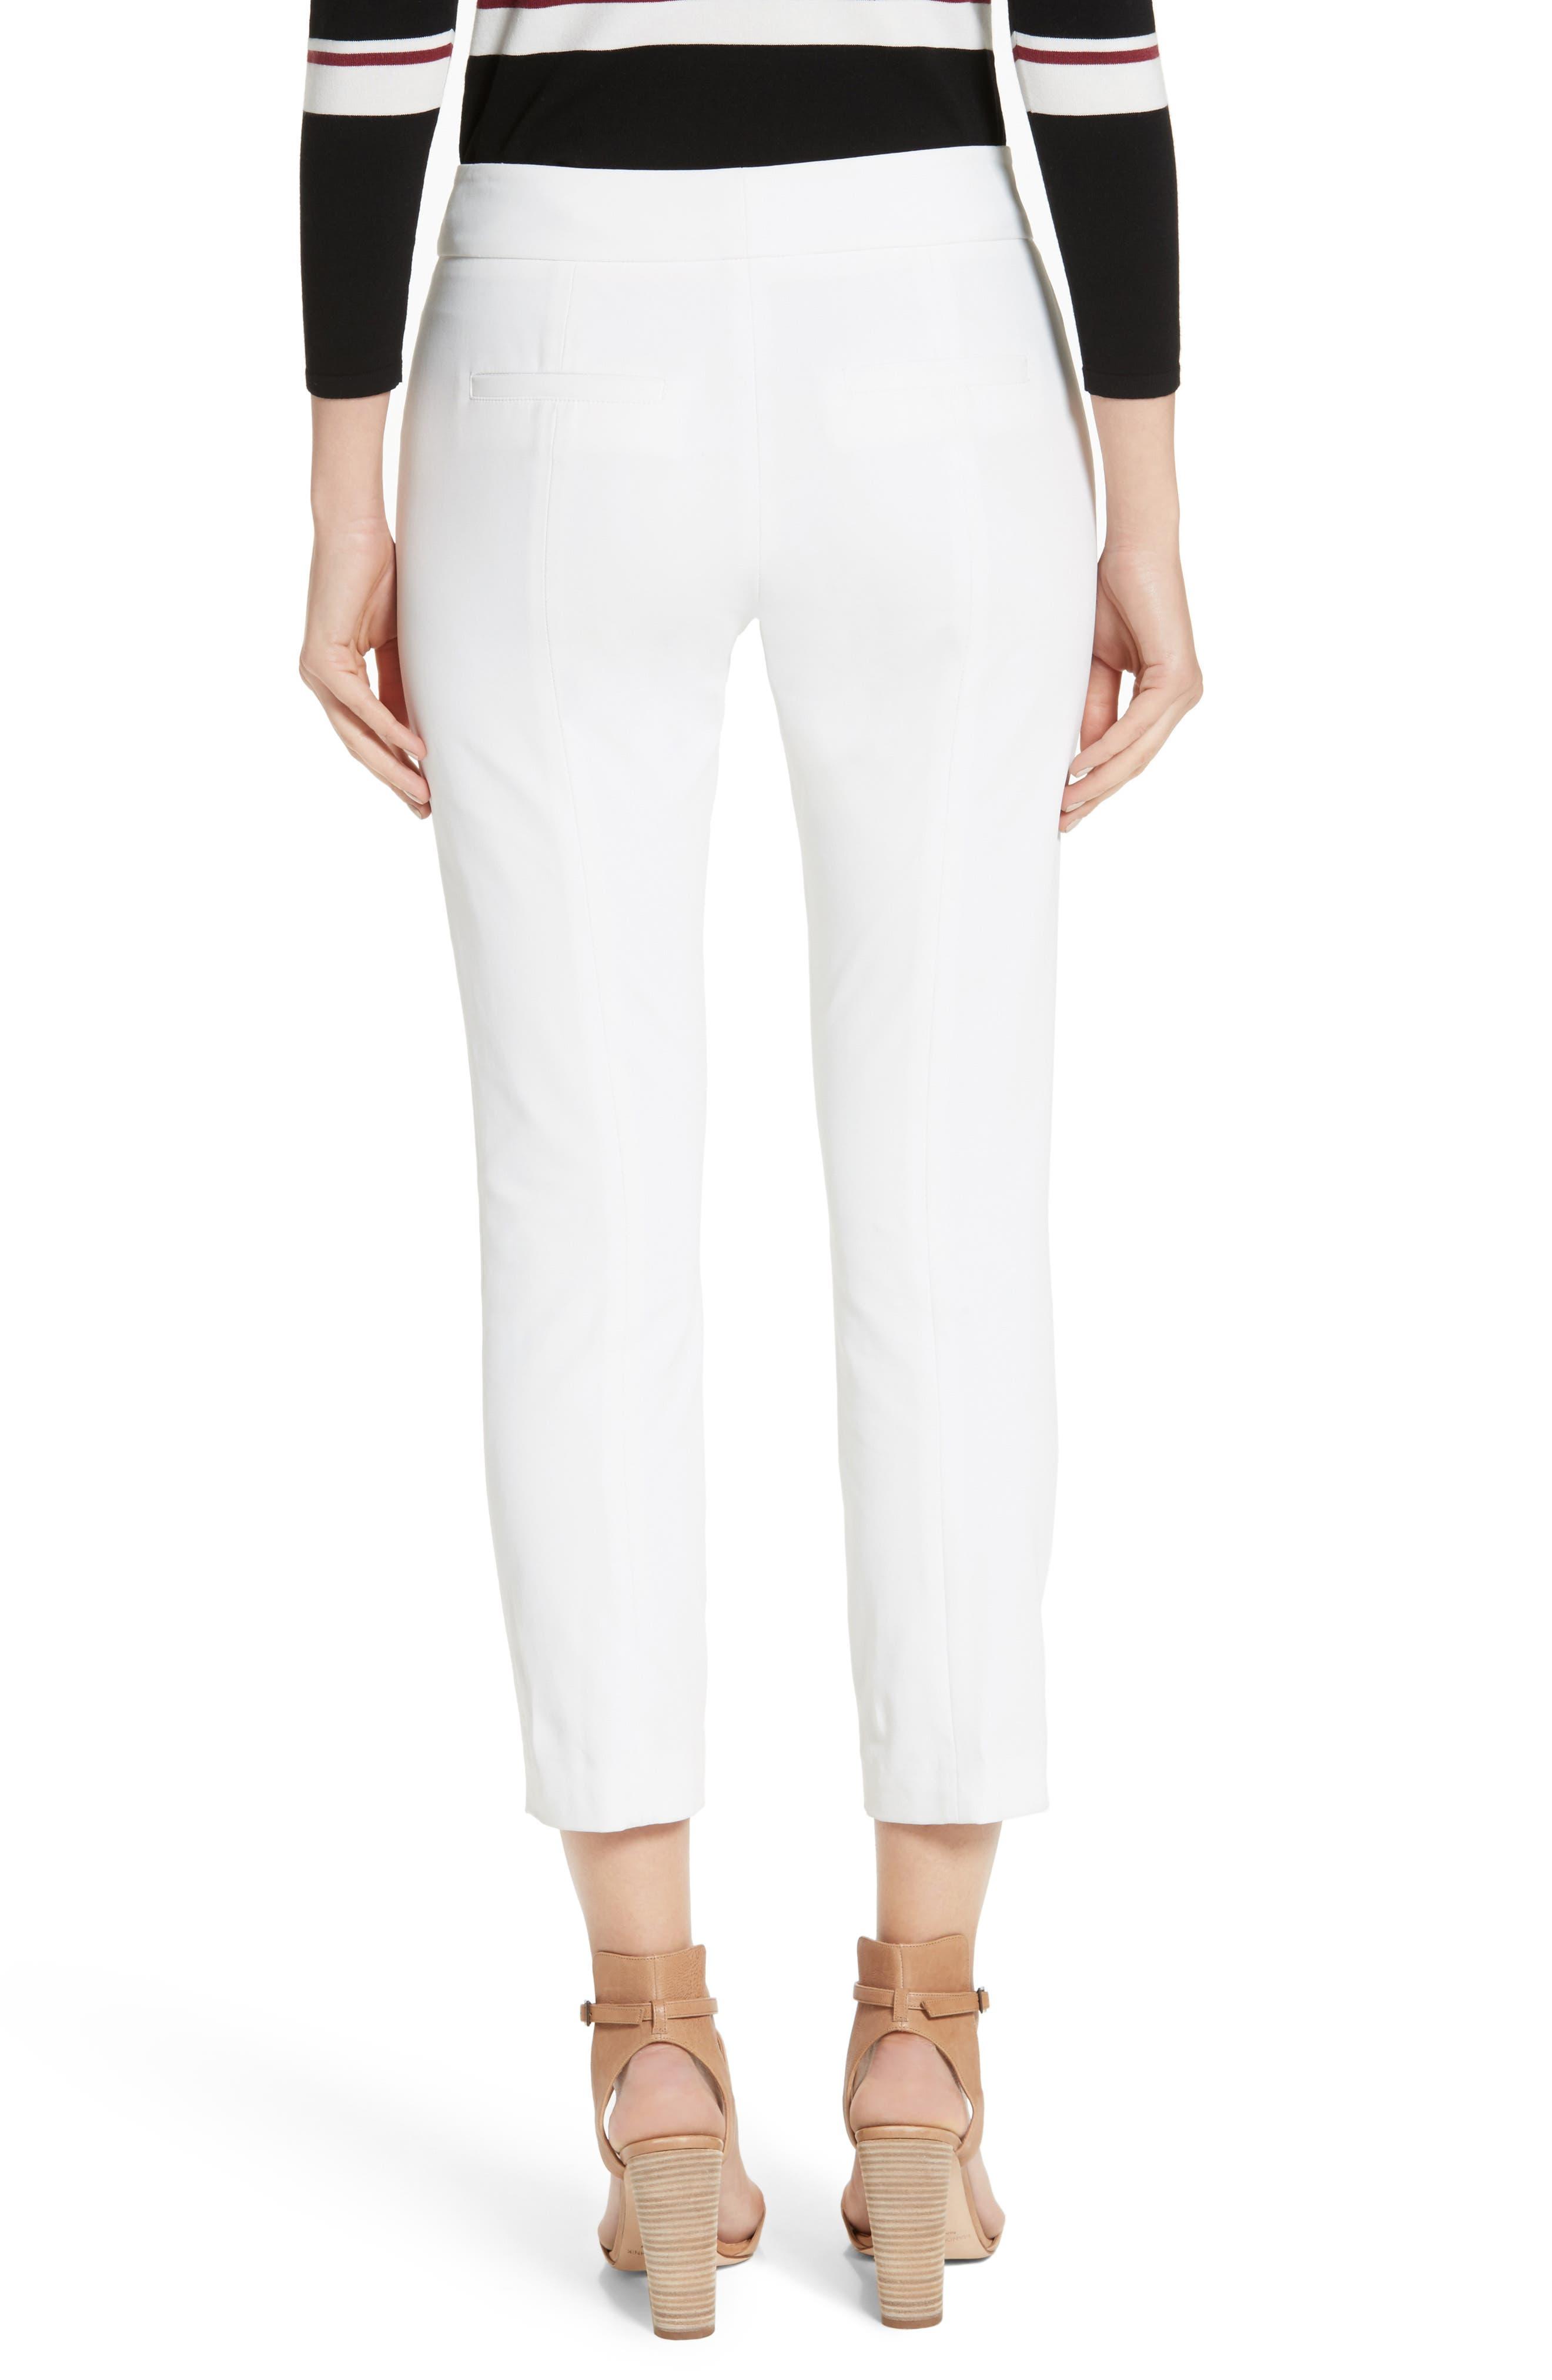 Roxy Crop Pants,                             Alternate thumbnail 2, color,                             WHITE